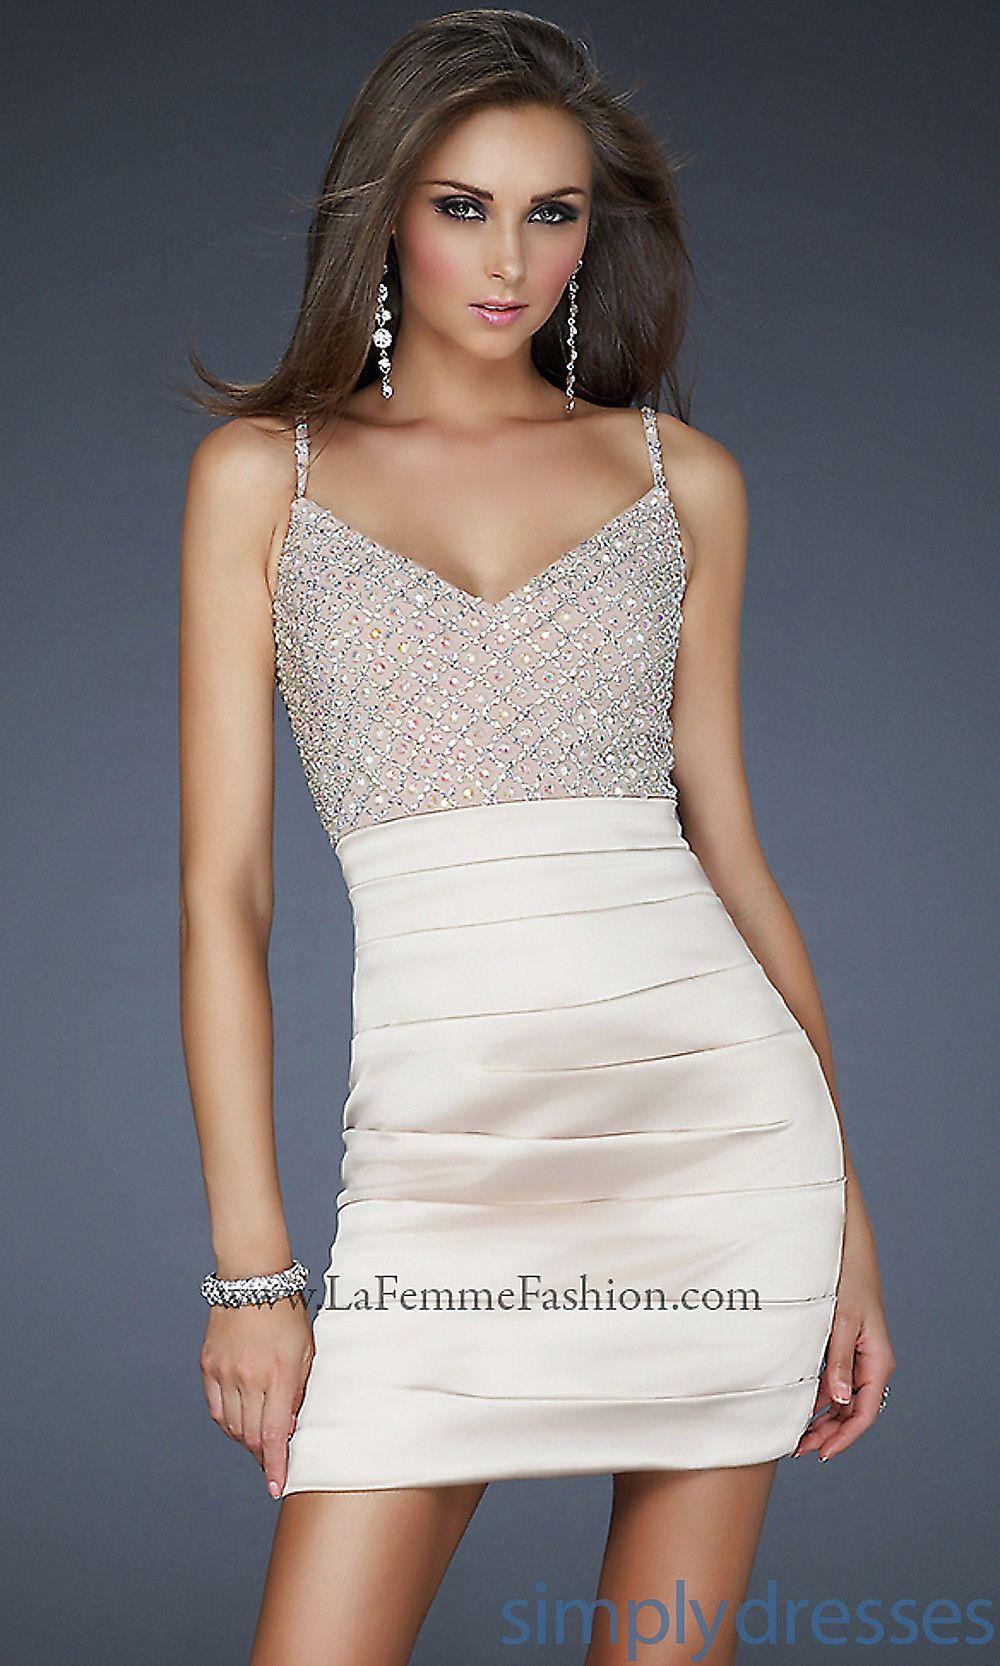 Short formal dresses satin cocktail dress simply dresses stuff